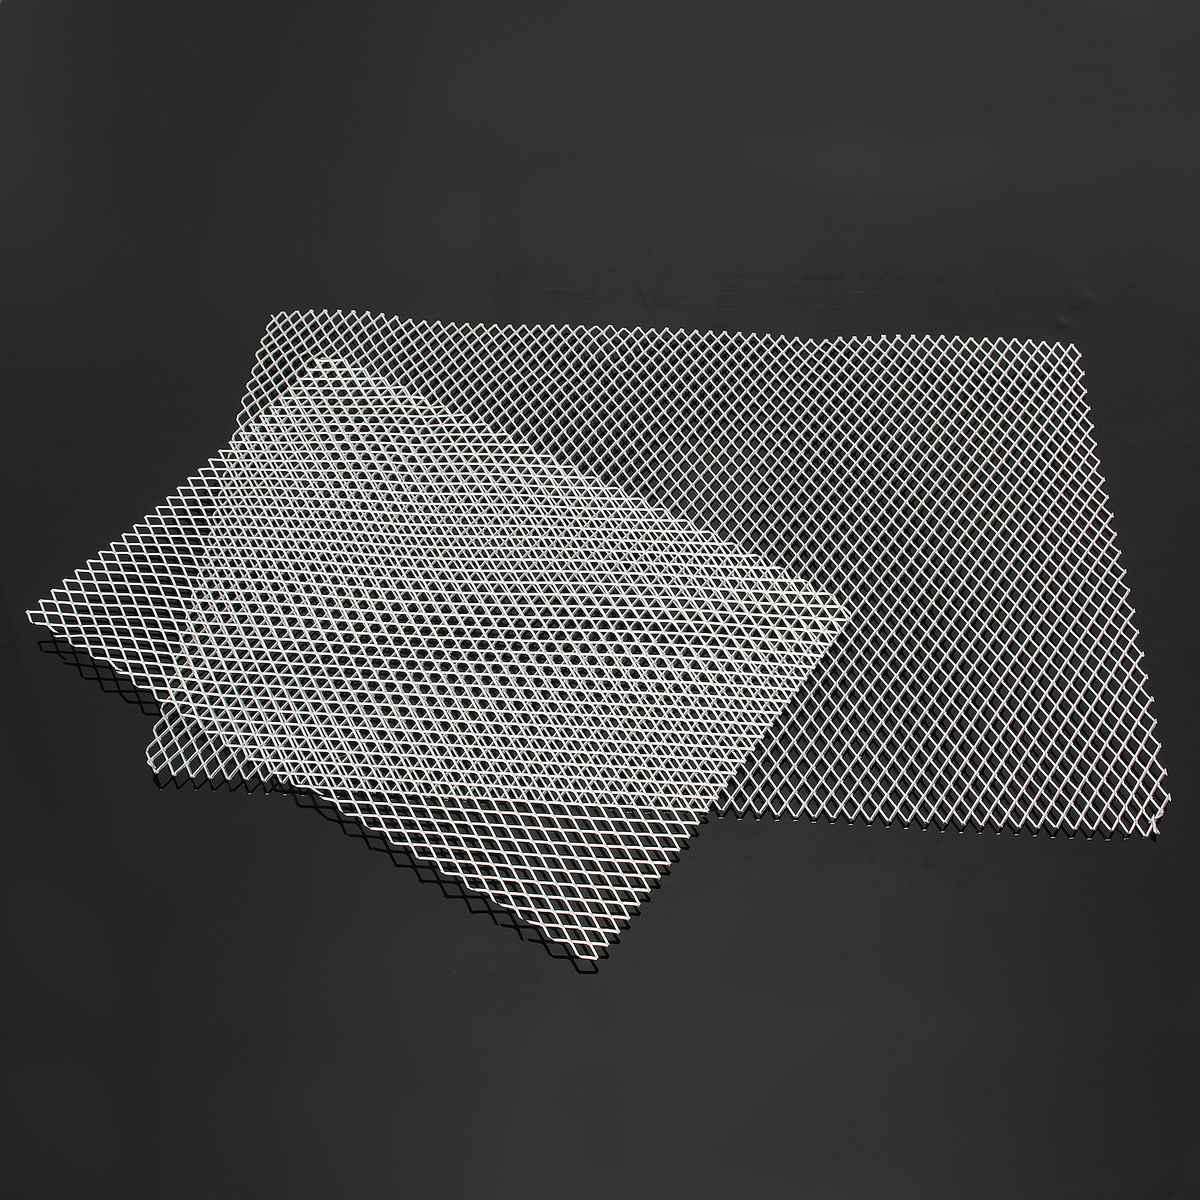 Mmx mm aluminum metal mesh perforated